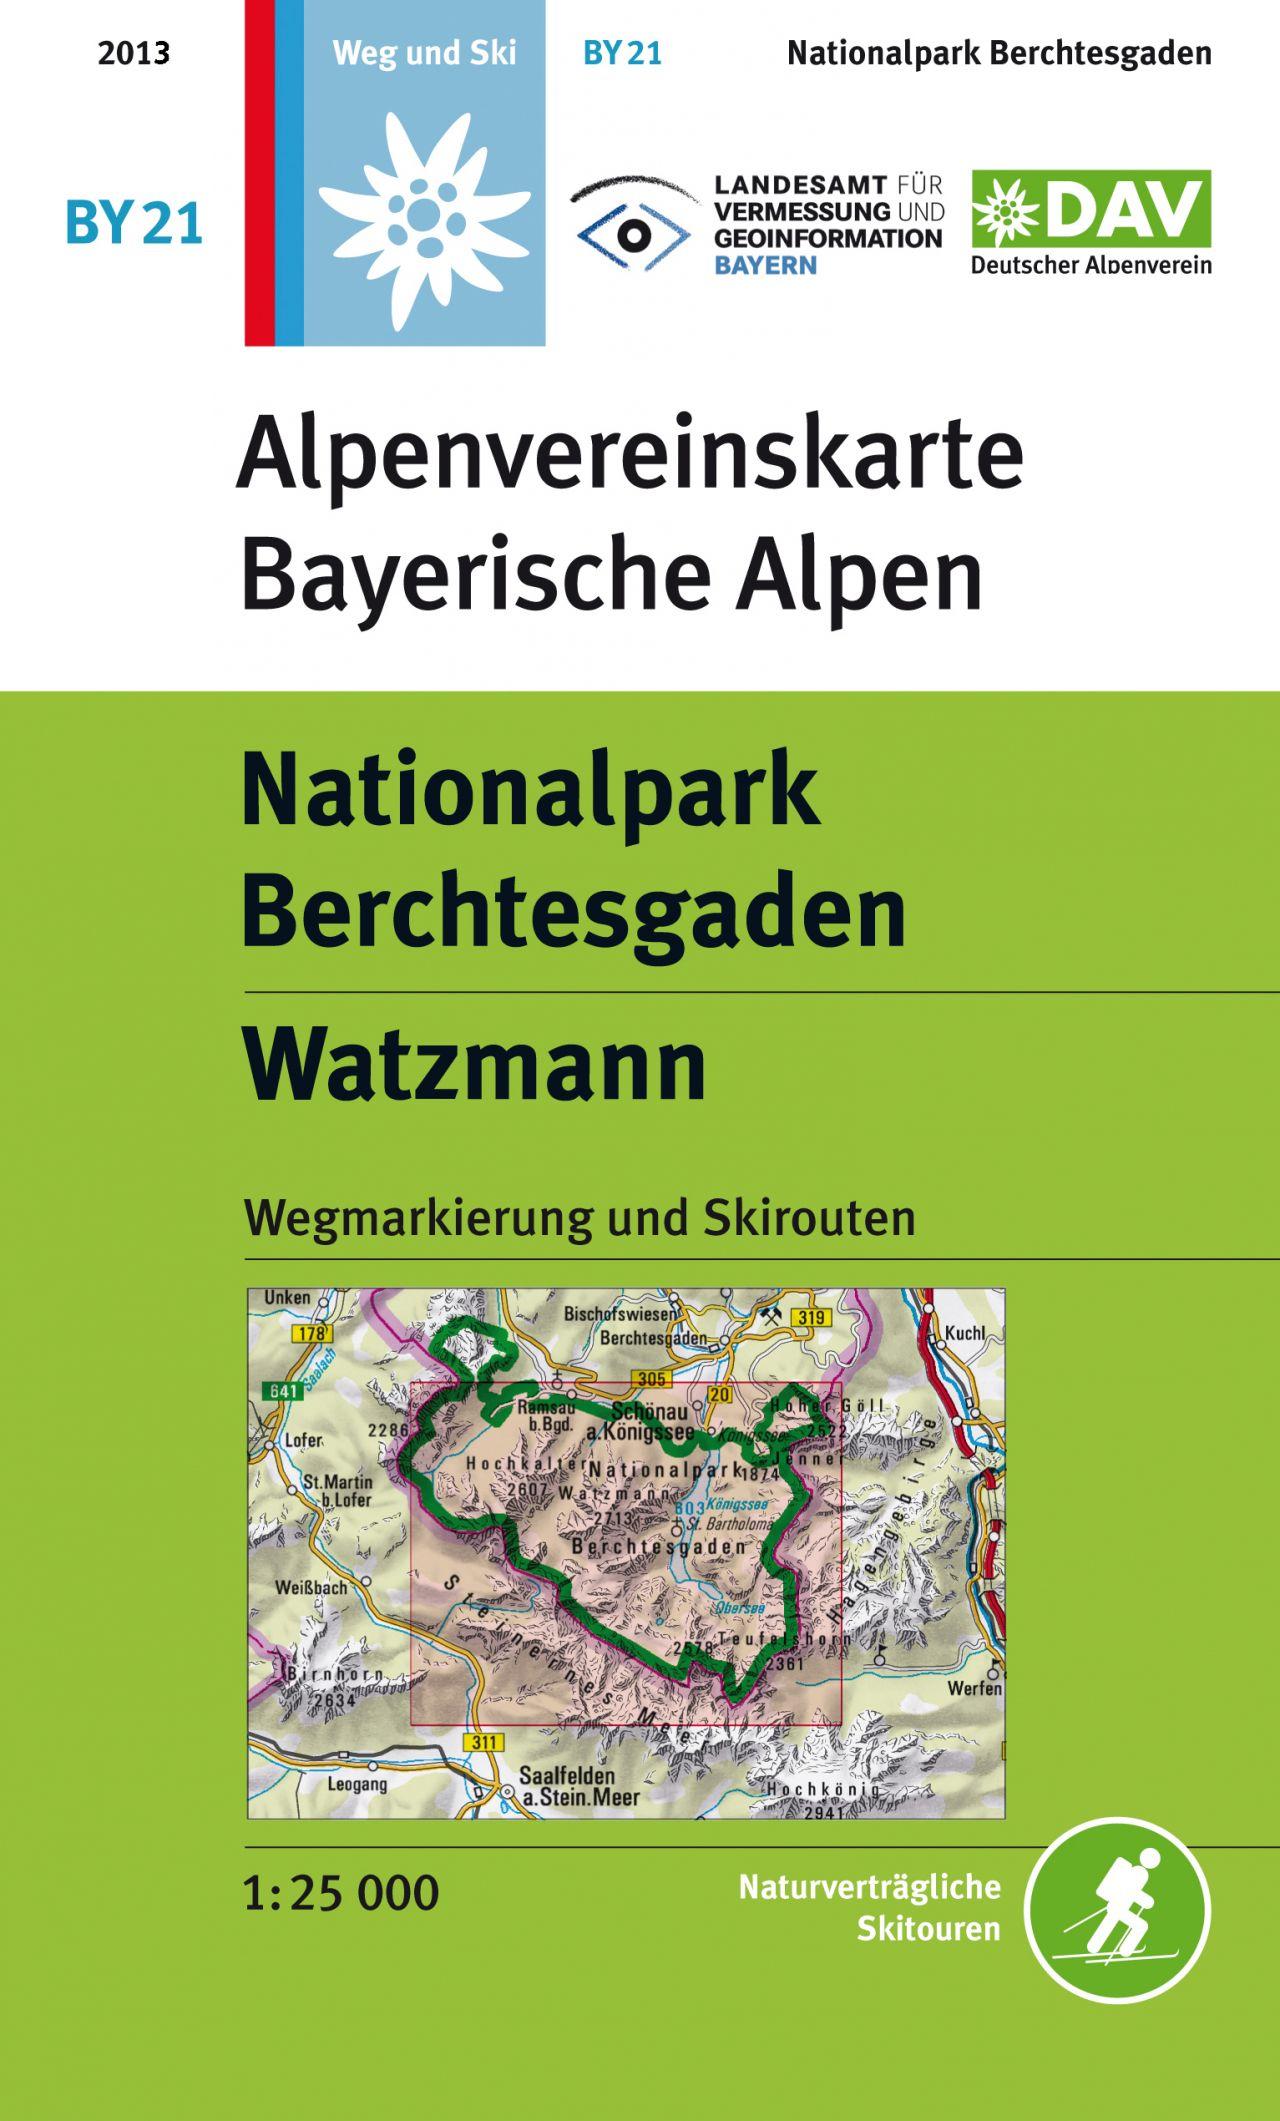 Wandelkaart BY21 Alpenvereinskarte Nationalpark Berchtesgaden - Watzmann | Alpenverein